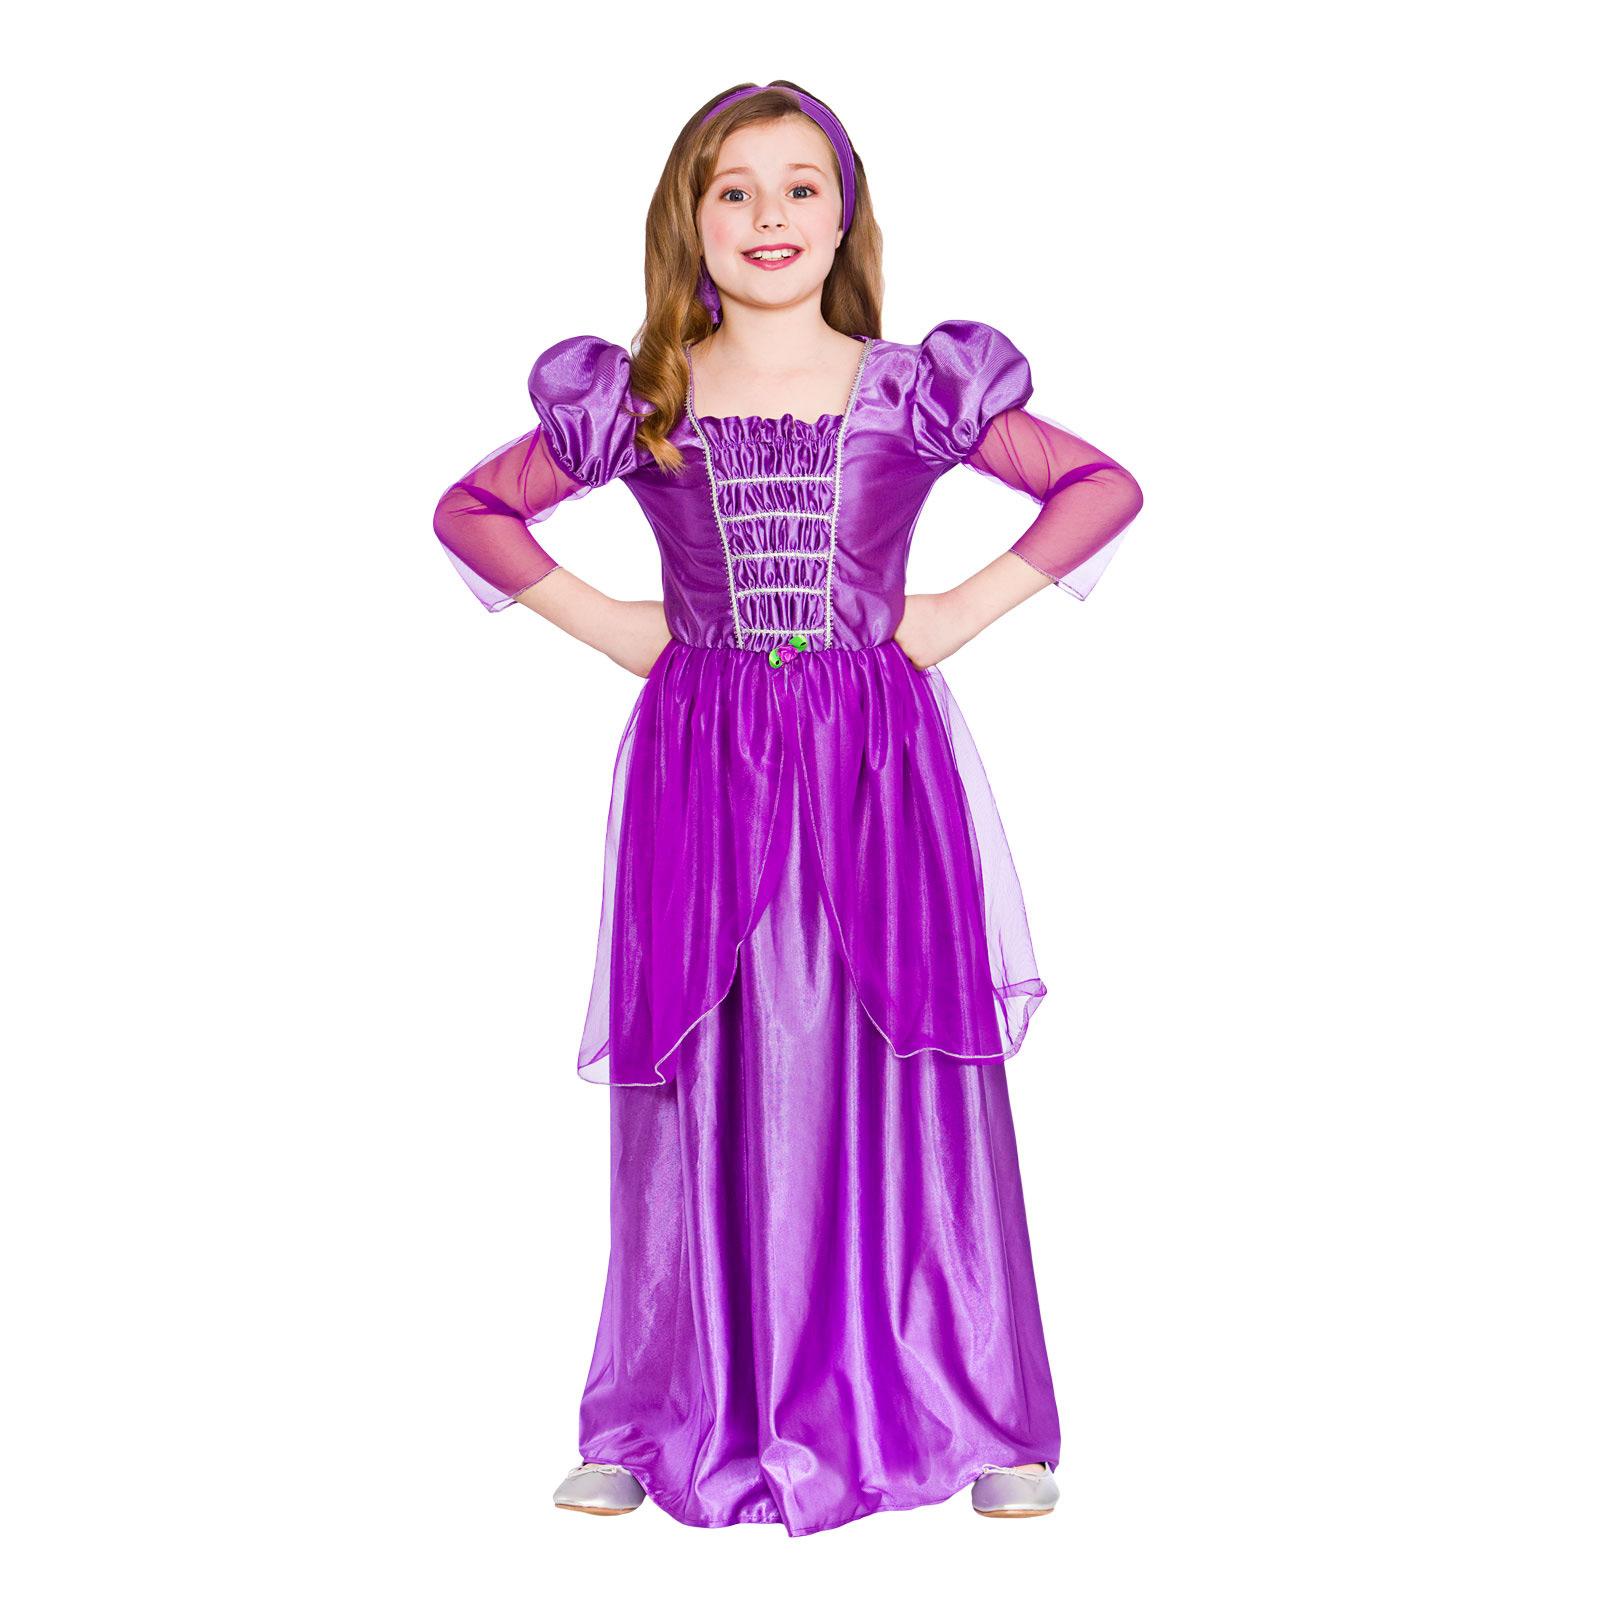 Halloween Girls Princess Fancy Dress Up Costume Outfits: Girls Sweet Princess Fancy Dress Up Party Costume